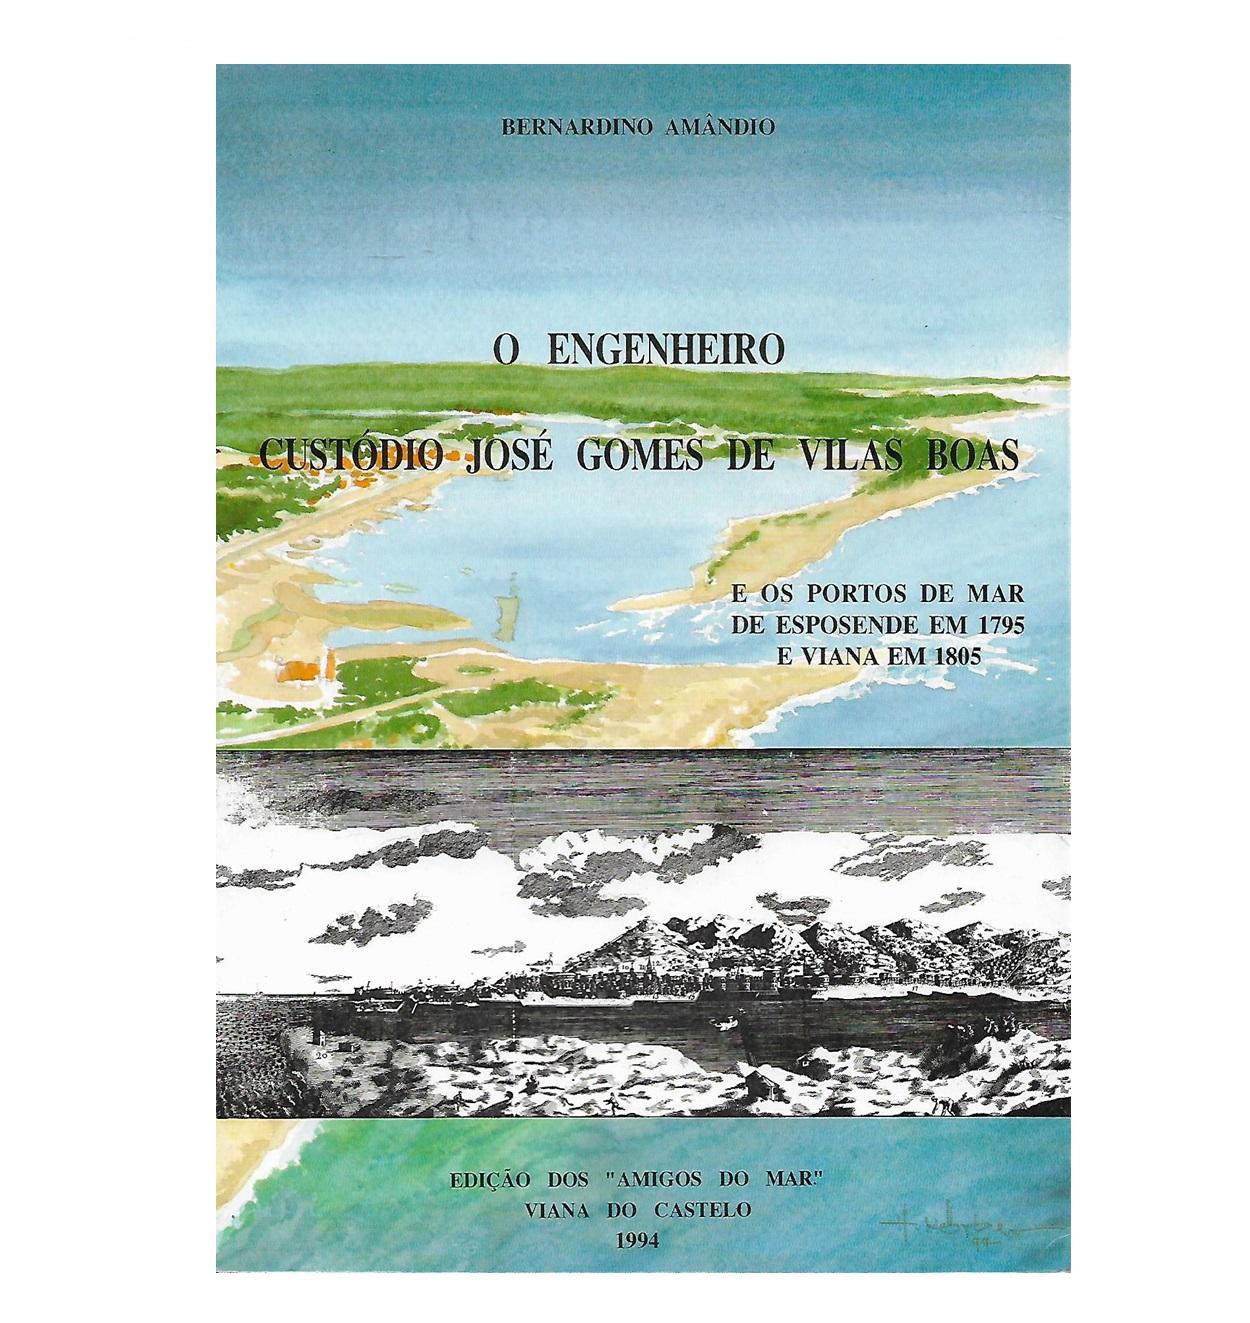 O Engenheiro Custódio José Gomes  de Vilas Boa